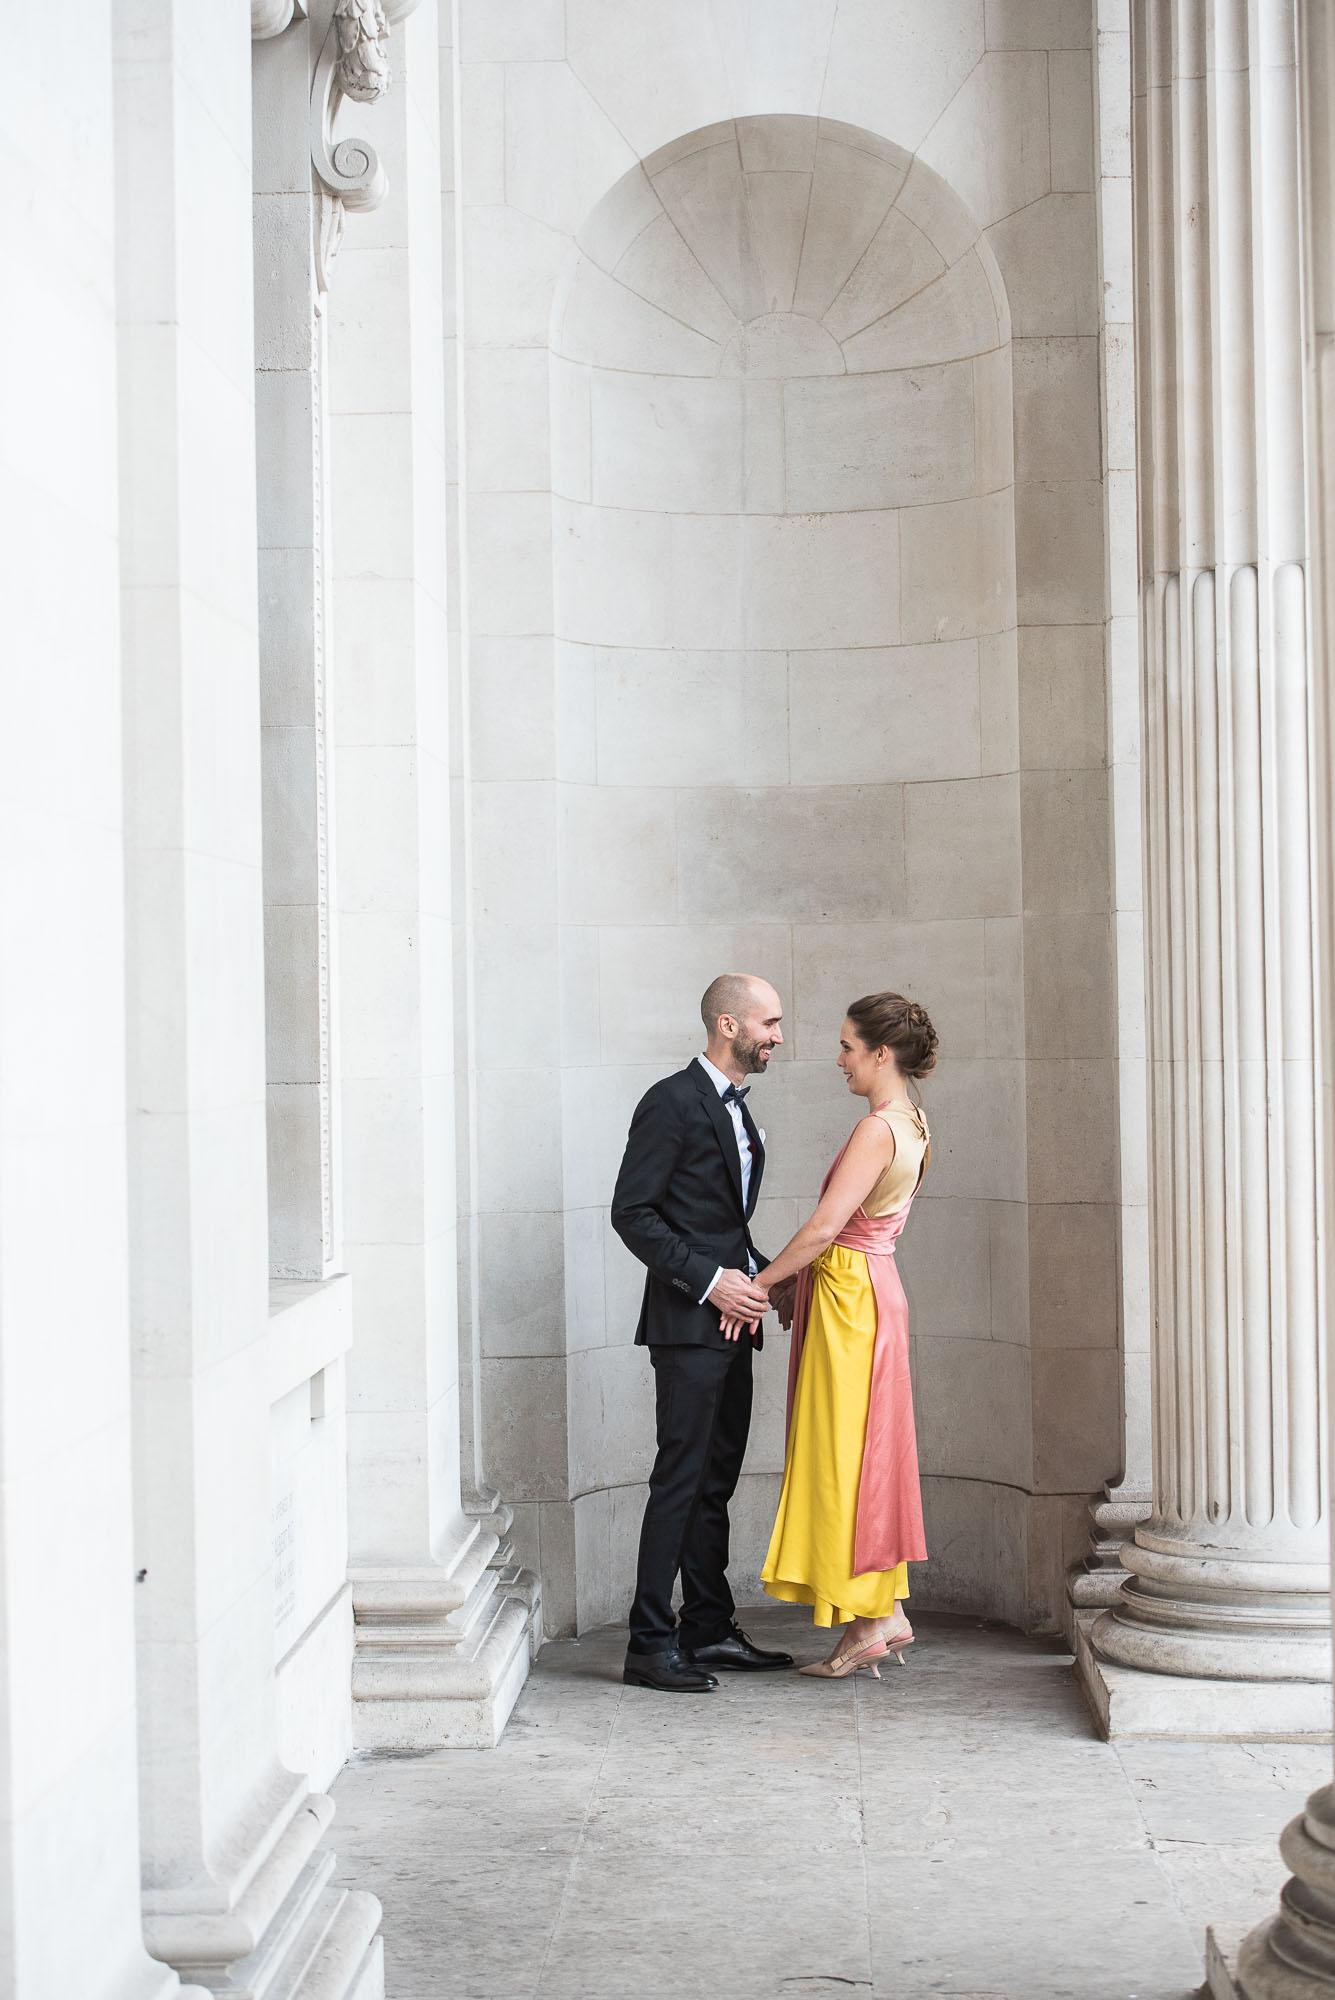 Our Wedding_HR (21 of 176).jpg